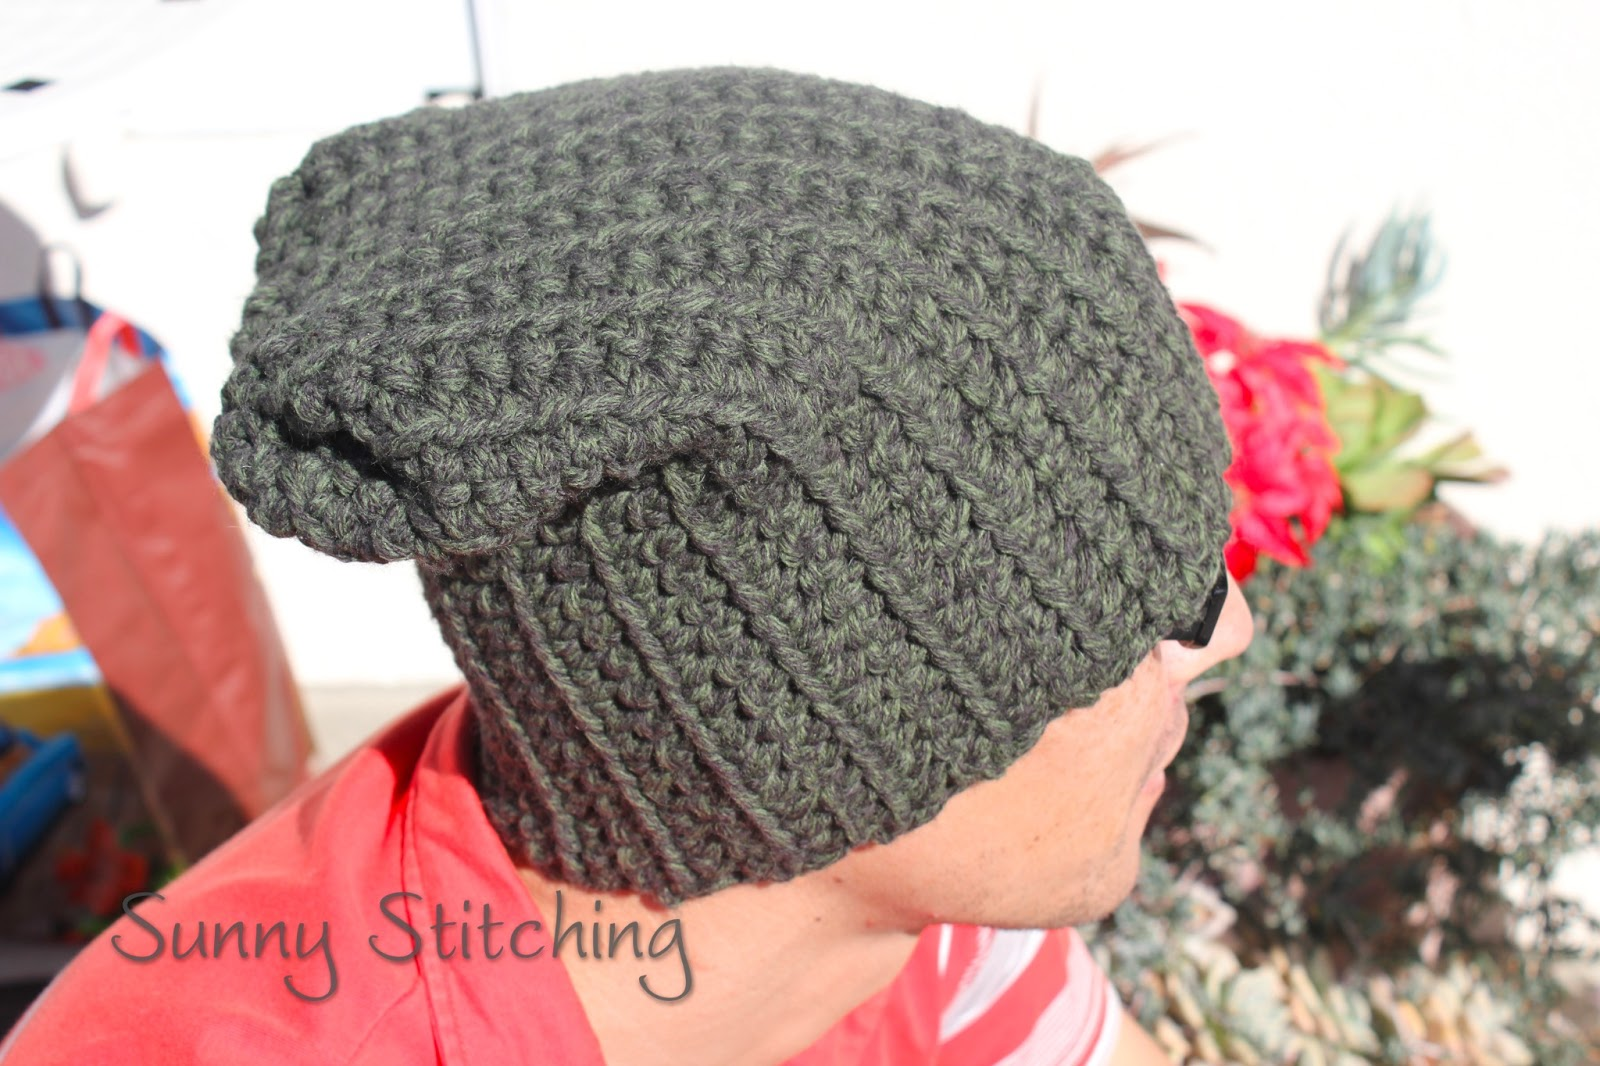 Crochet Ribbed Slouchy Hat Free Pattern : Sunny Stitching: sunnystitching.blogspot.com/2013/01/slouchy-hat-crochet-pattern.html